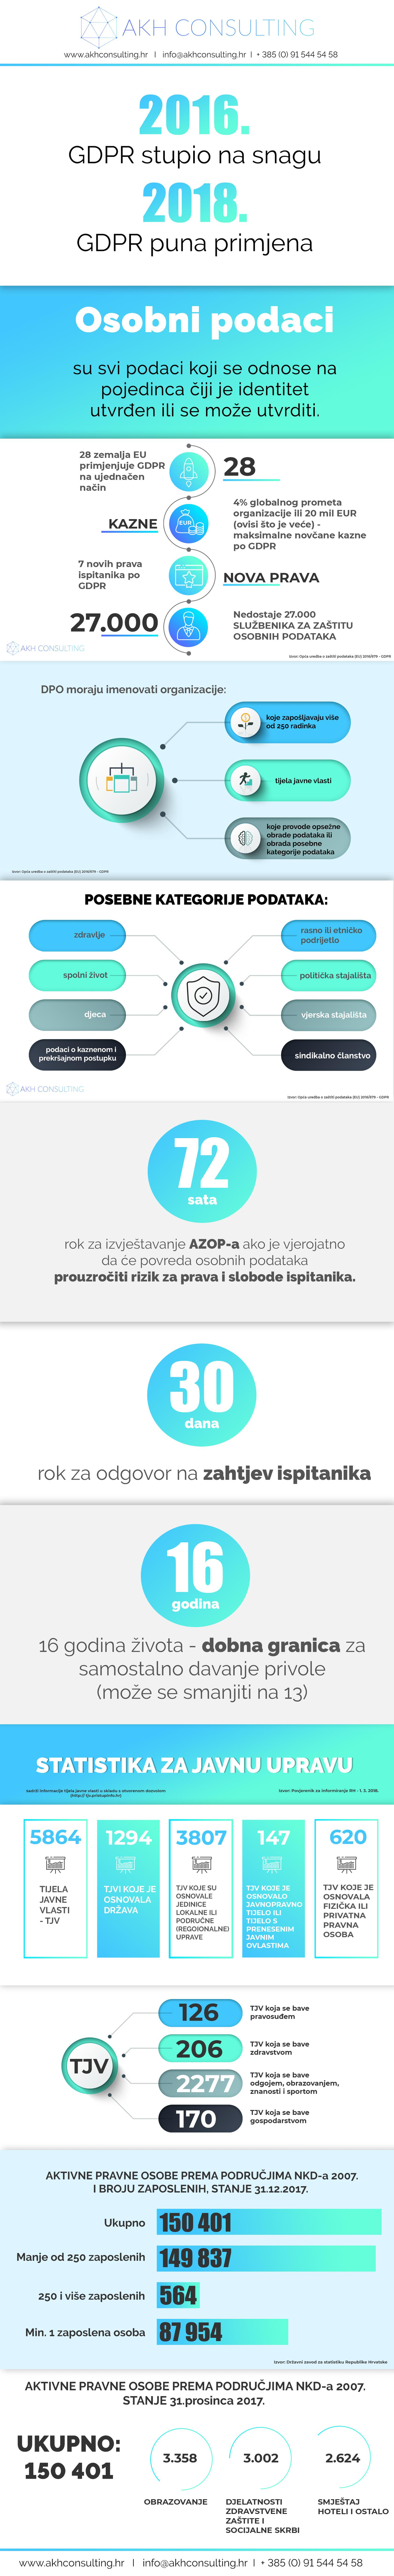 GDPR i Hrvatska 2018 - infografika AKH CONSULTING